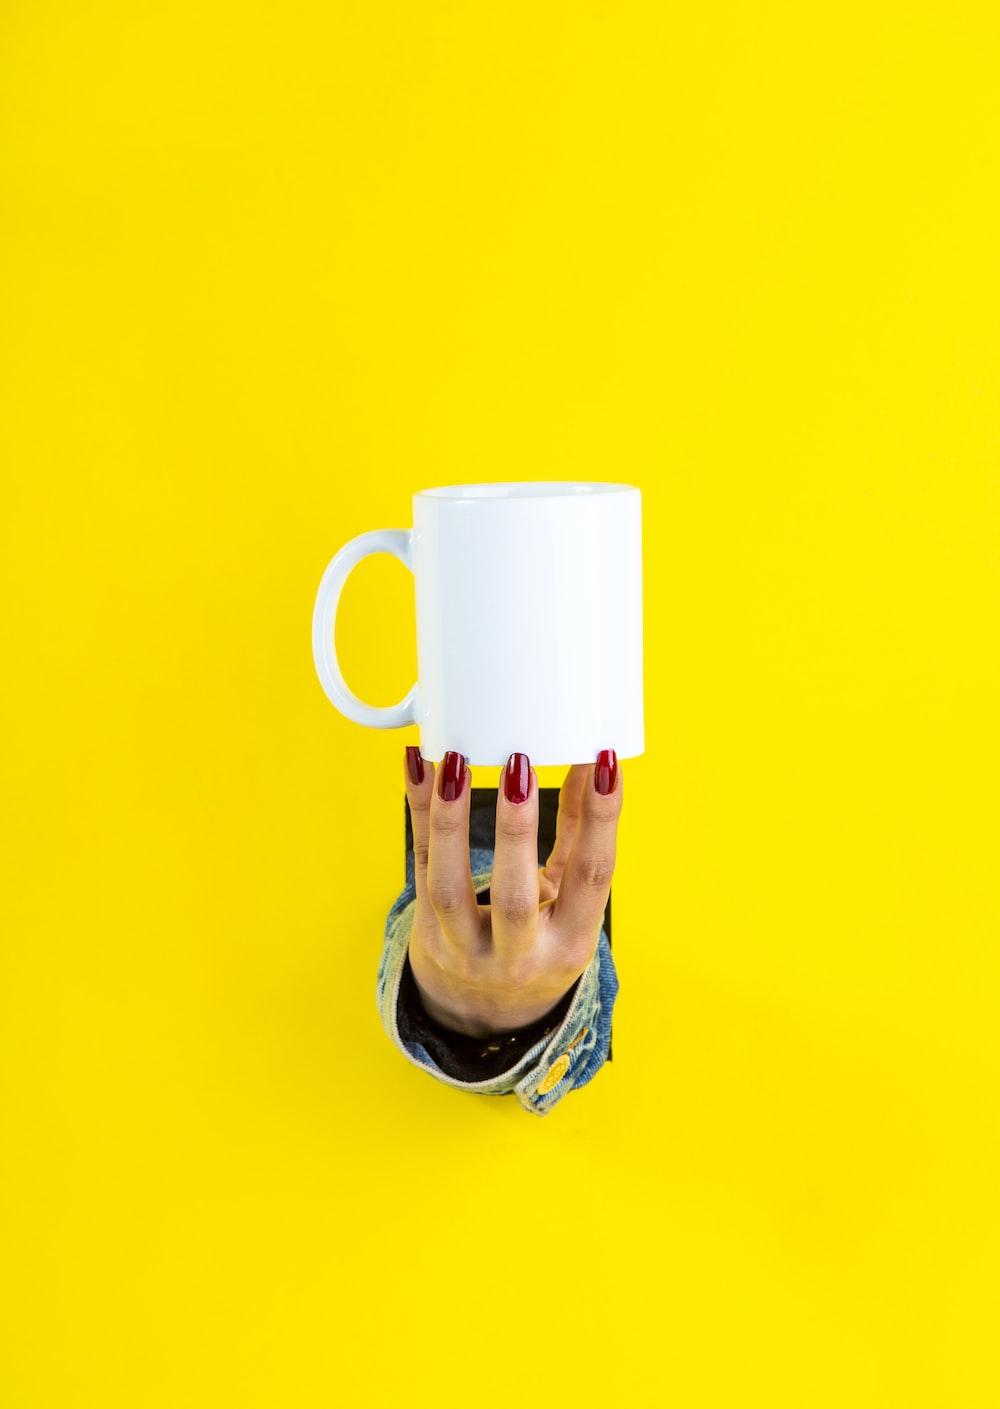 red nail polished hand holding white ceramic mug by fingertips